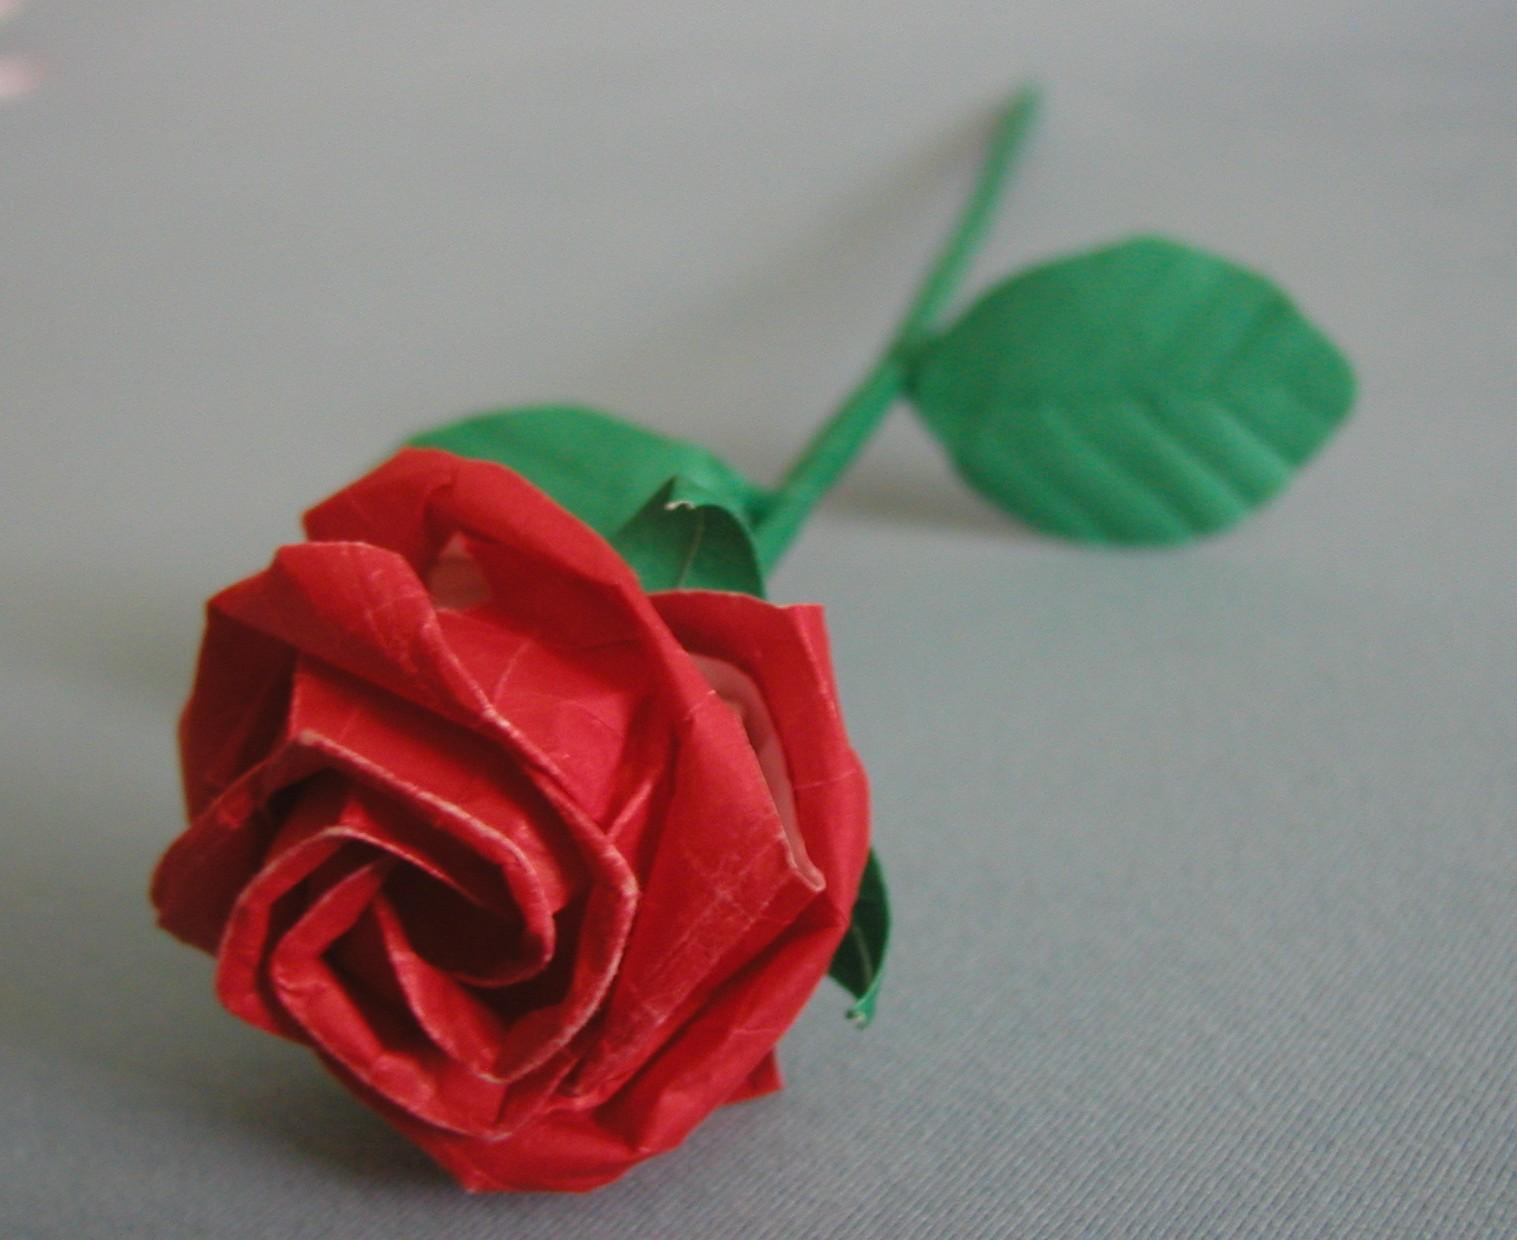 New kawasaki rose by UzeninaG on DeviantArt - photo#16